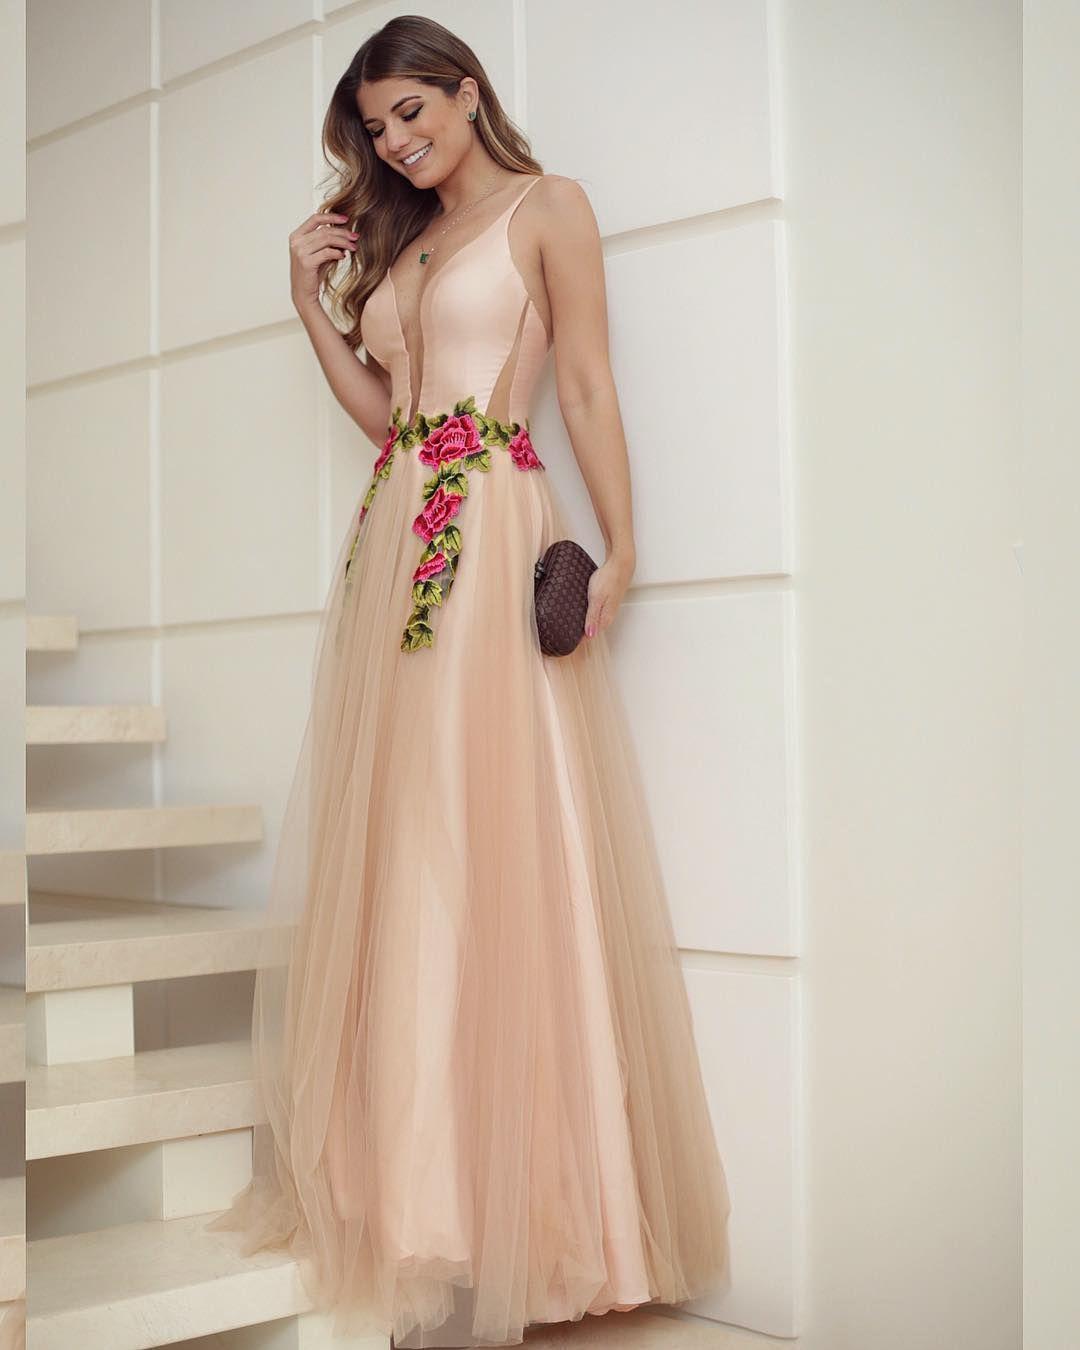 a916d03e5 Vestido  tugore ♥ ♥ Tule nude com bordado floral!! A marca tem os vestidos  de festas mais lindos da vidaaa